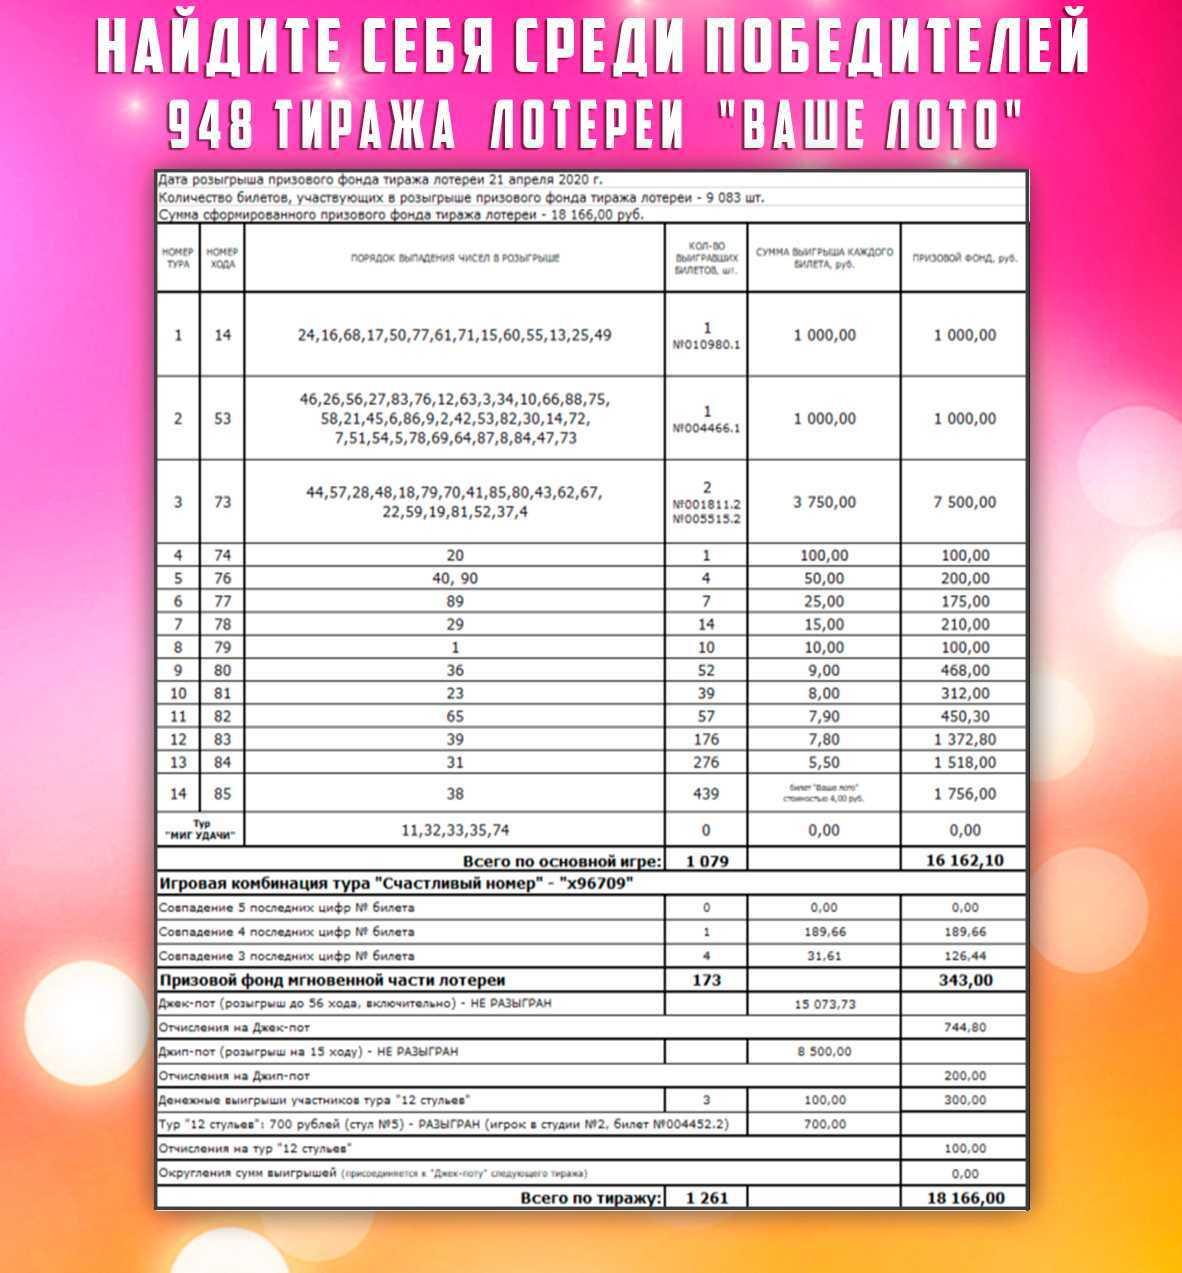 Tjek russisk lottobillet | resultater 1346 cirkulation